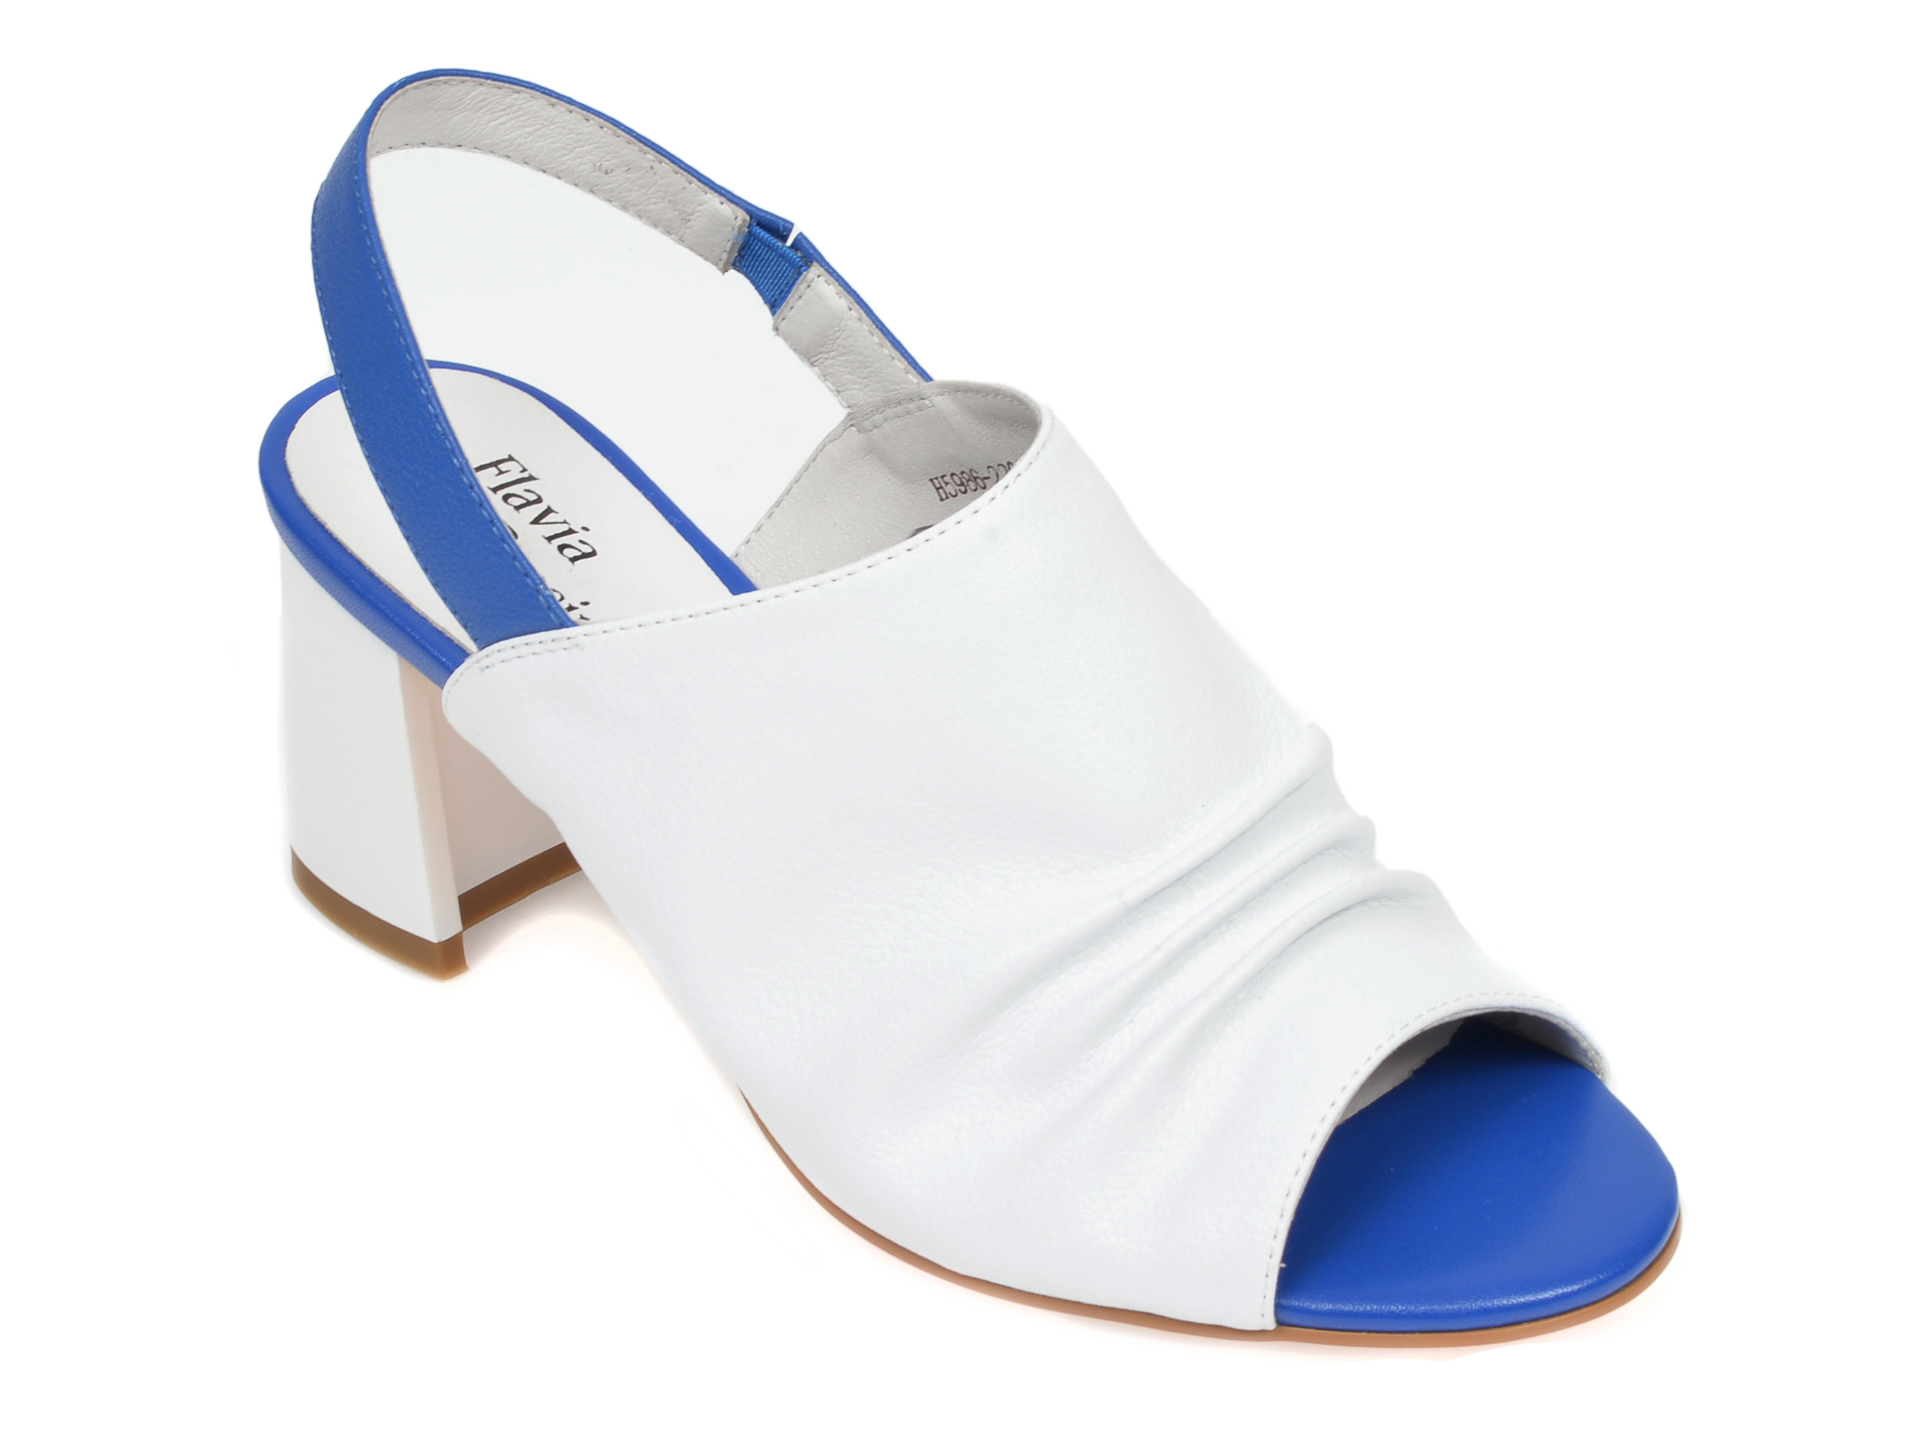 Sandale FLAVIA PASSINI albe, H598622, din piele naturala imagine